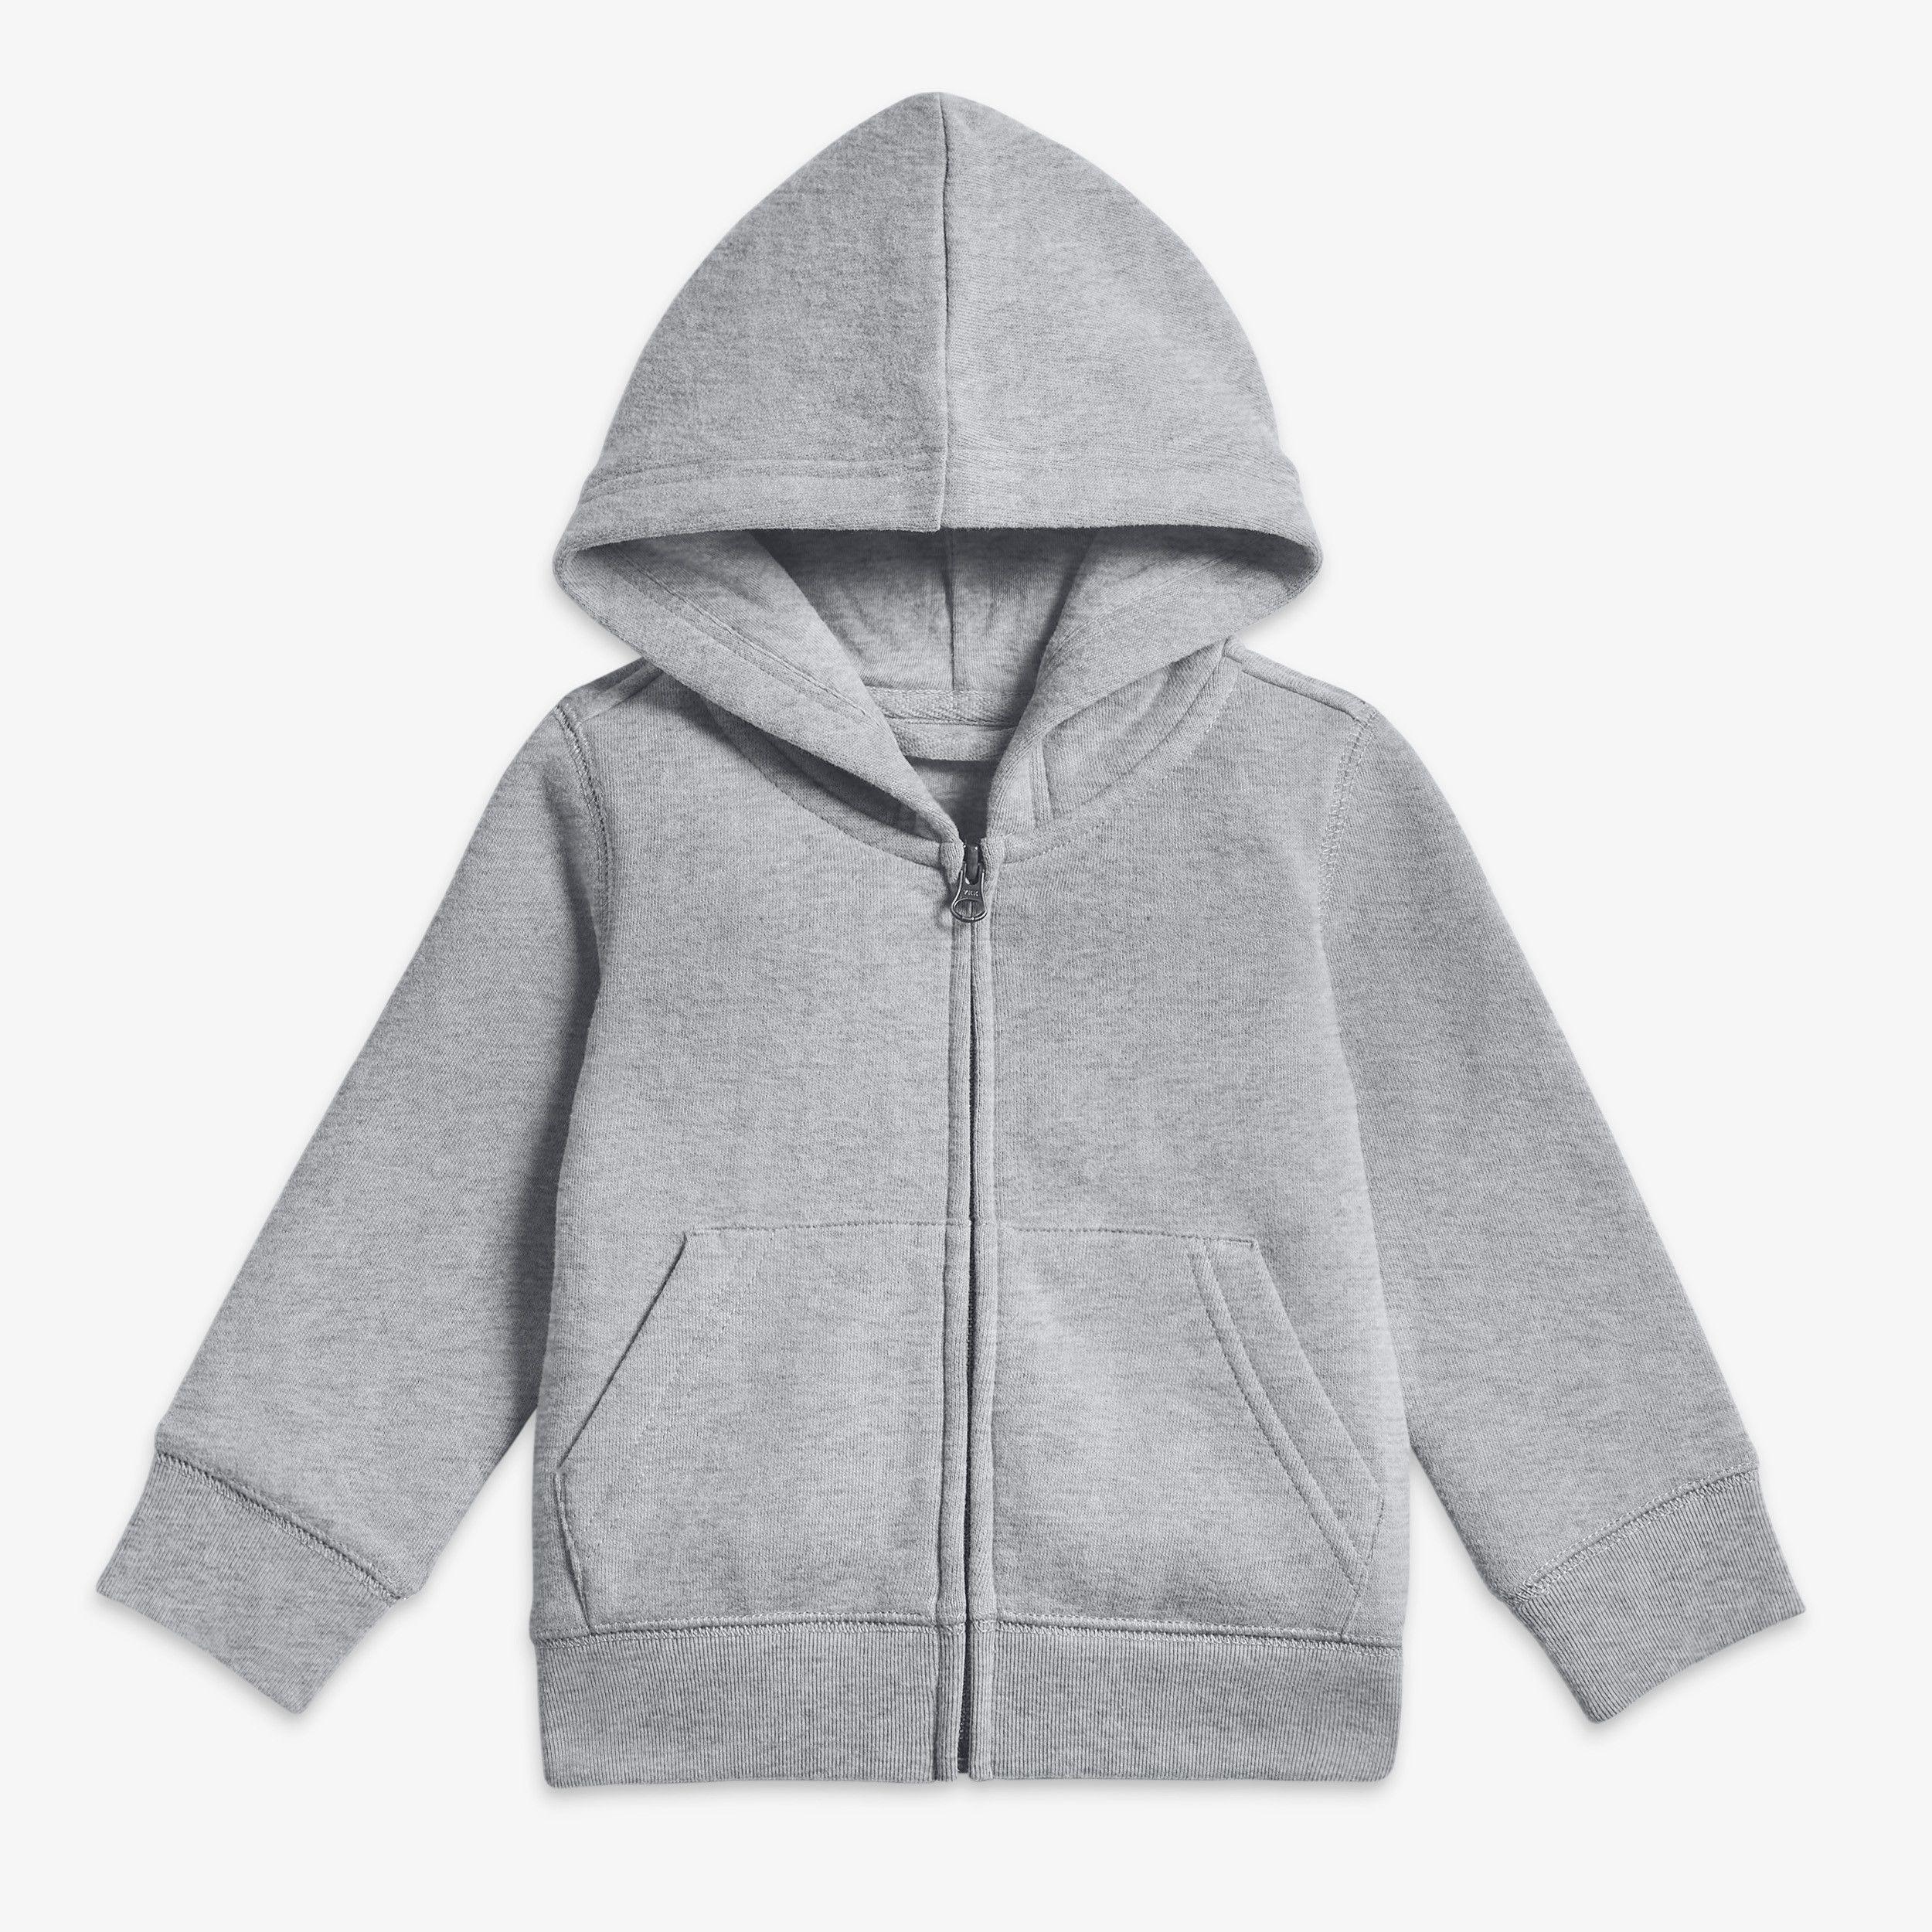 Baby Cozy Zip Hoodie Hoodies Quality Kids Clothes Hooded Sweatshirts [ 2500 x 2500 Pixel ]